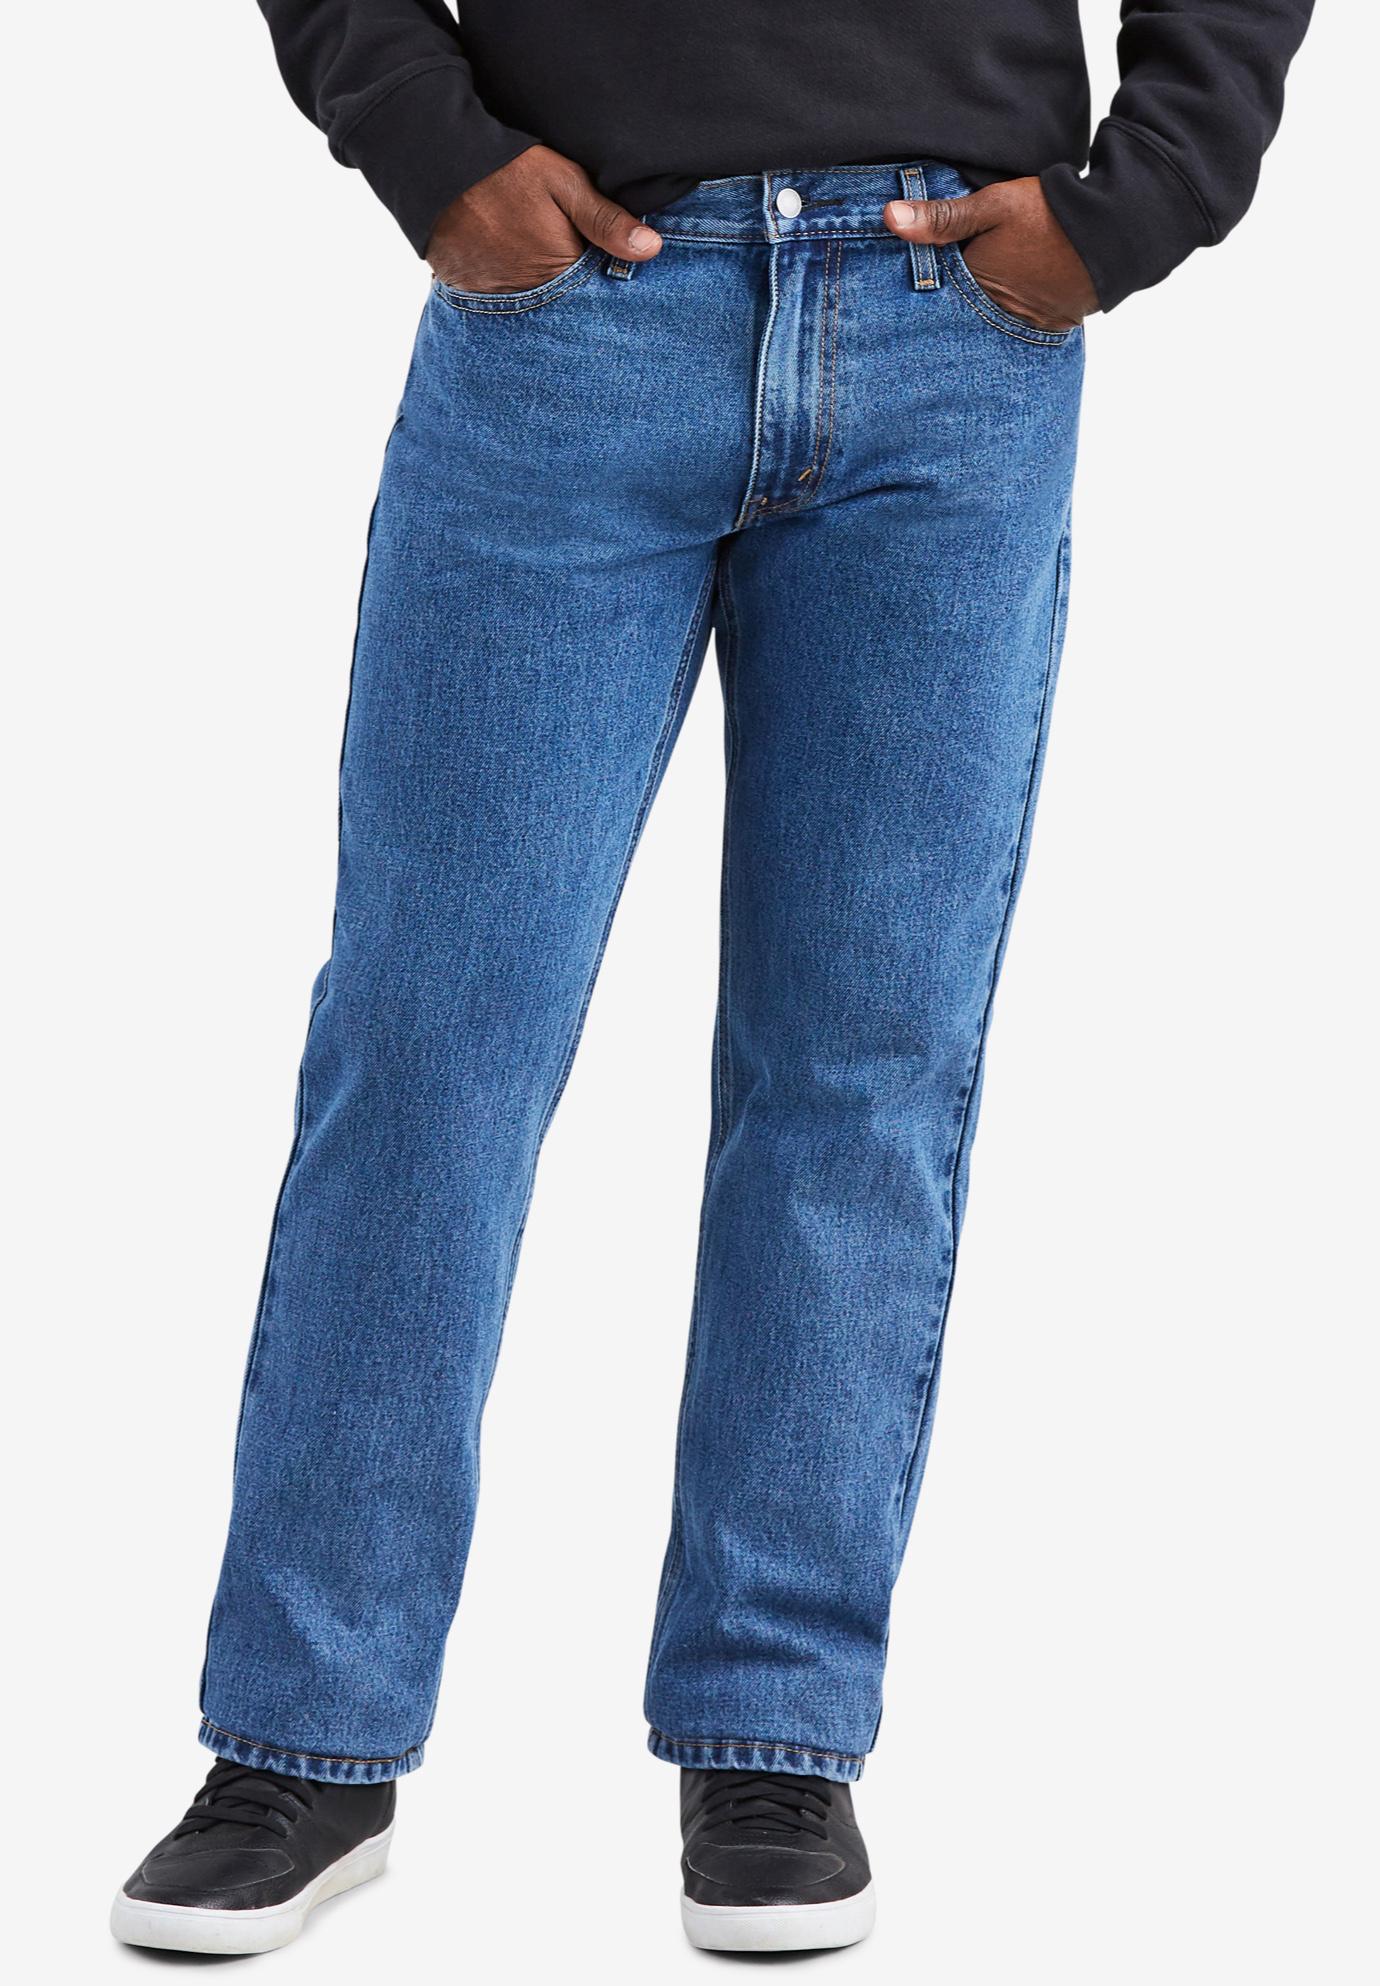 77bdbb904b9 Levi's® 541™ Athletic Taper Jeans| Big and Tall Pants & Shorts ...